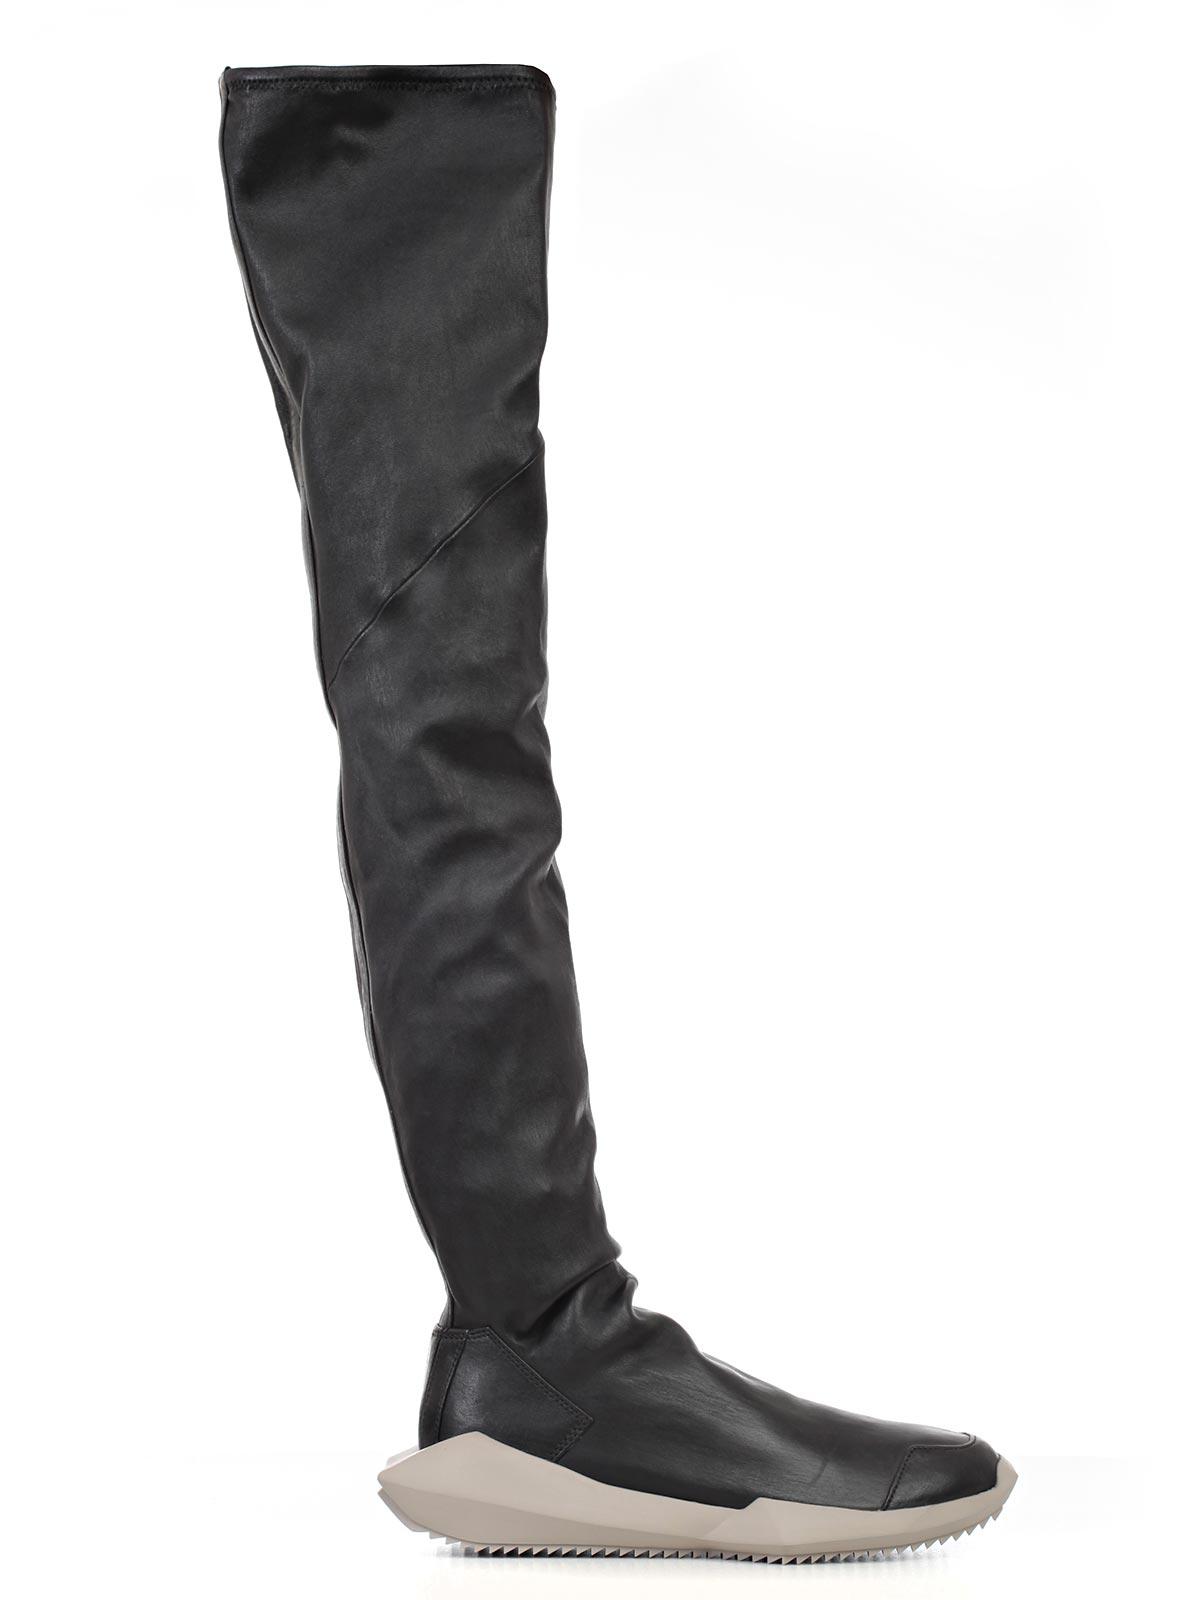 Picture of RICK OWENS Footwear